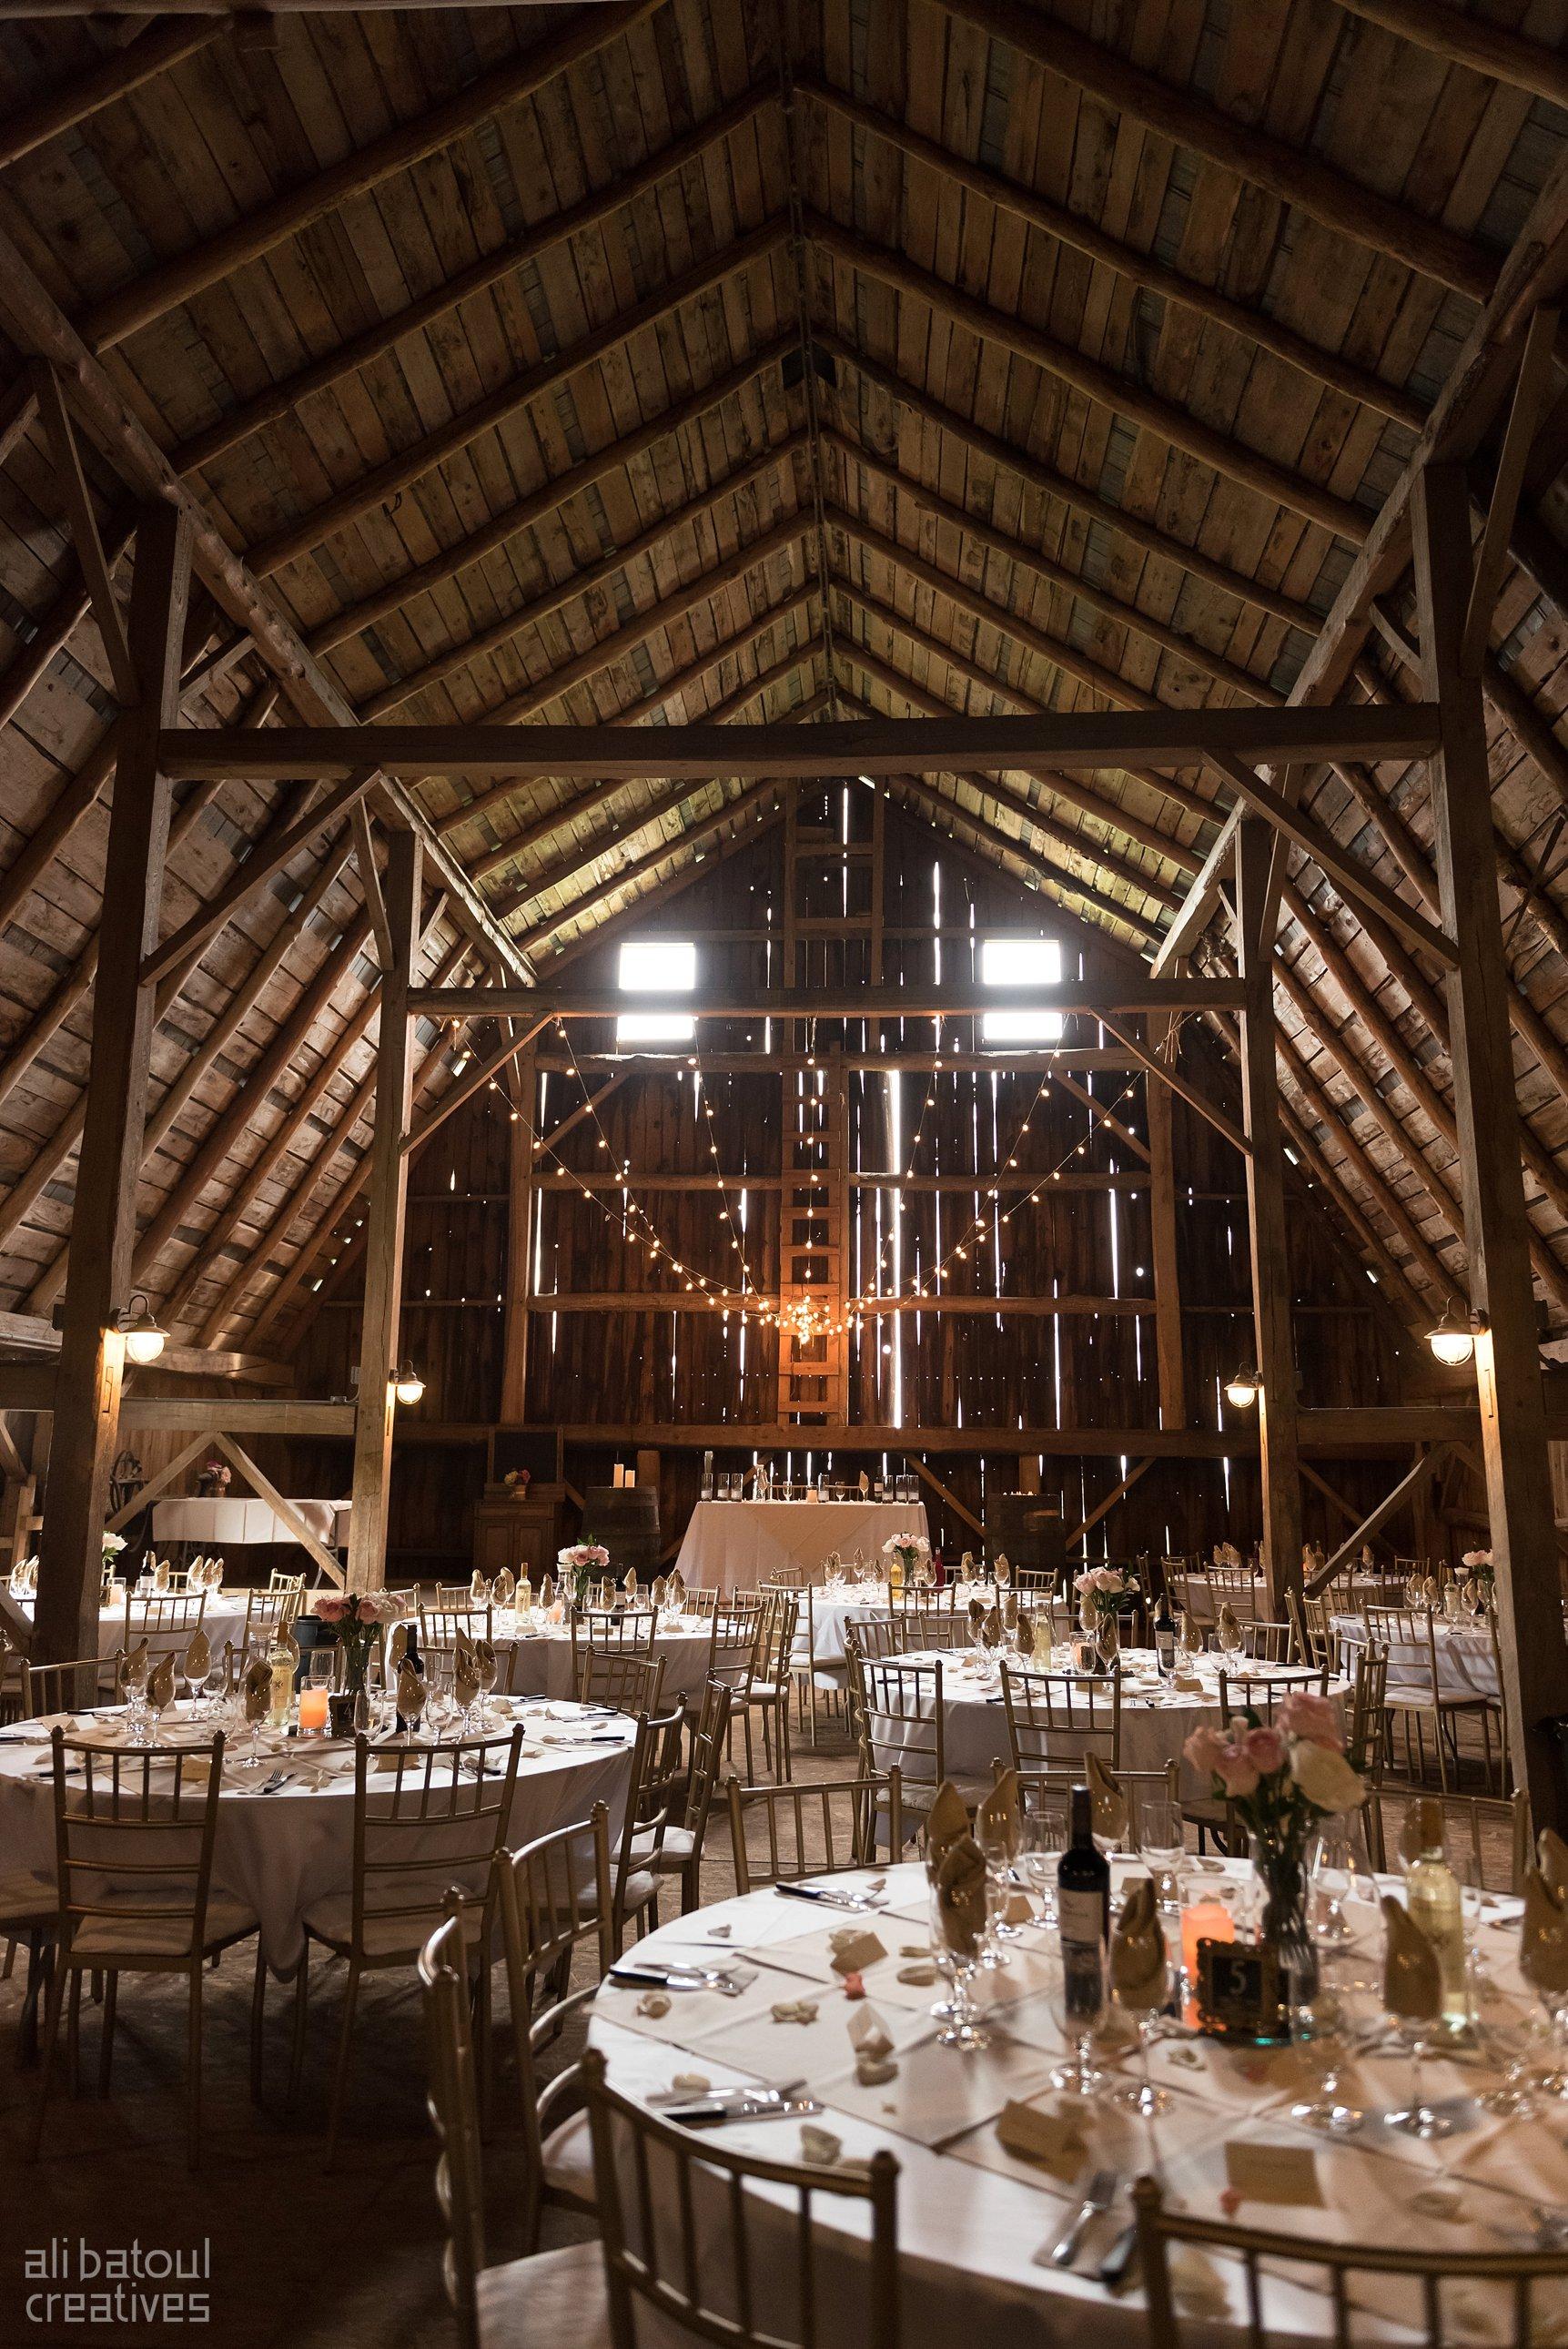 Samer + Brittany Barn Wedding - Ali Batoul Creatives (blog)-22_Stomped.jpg